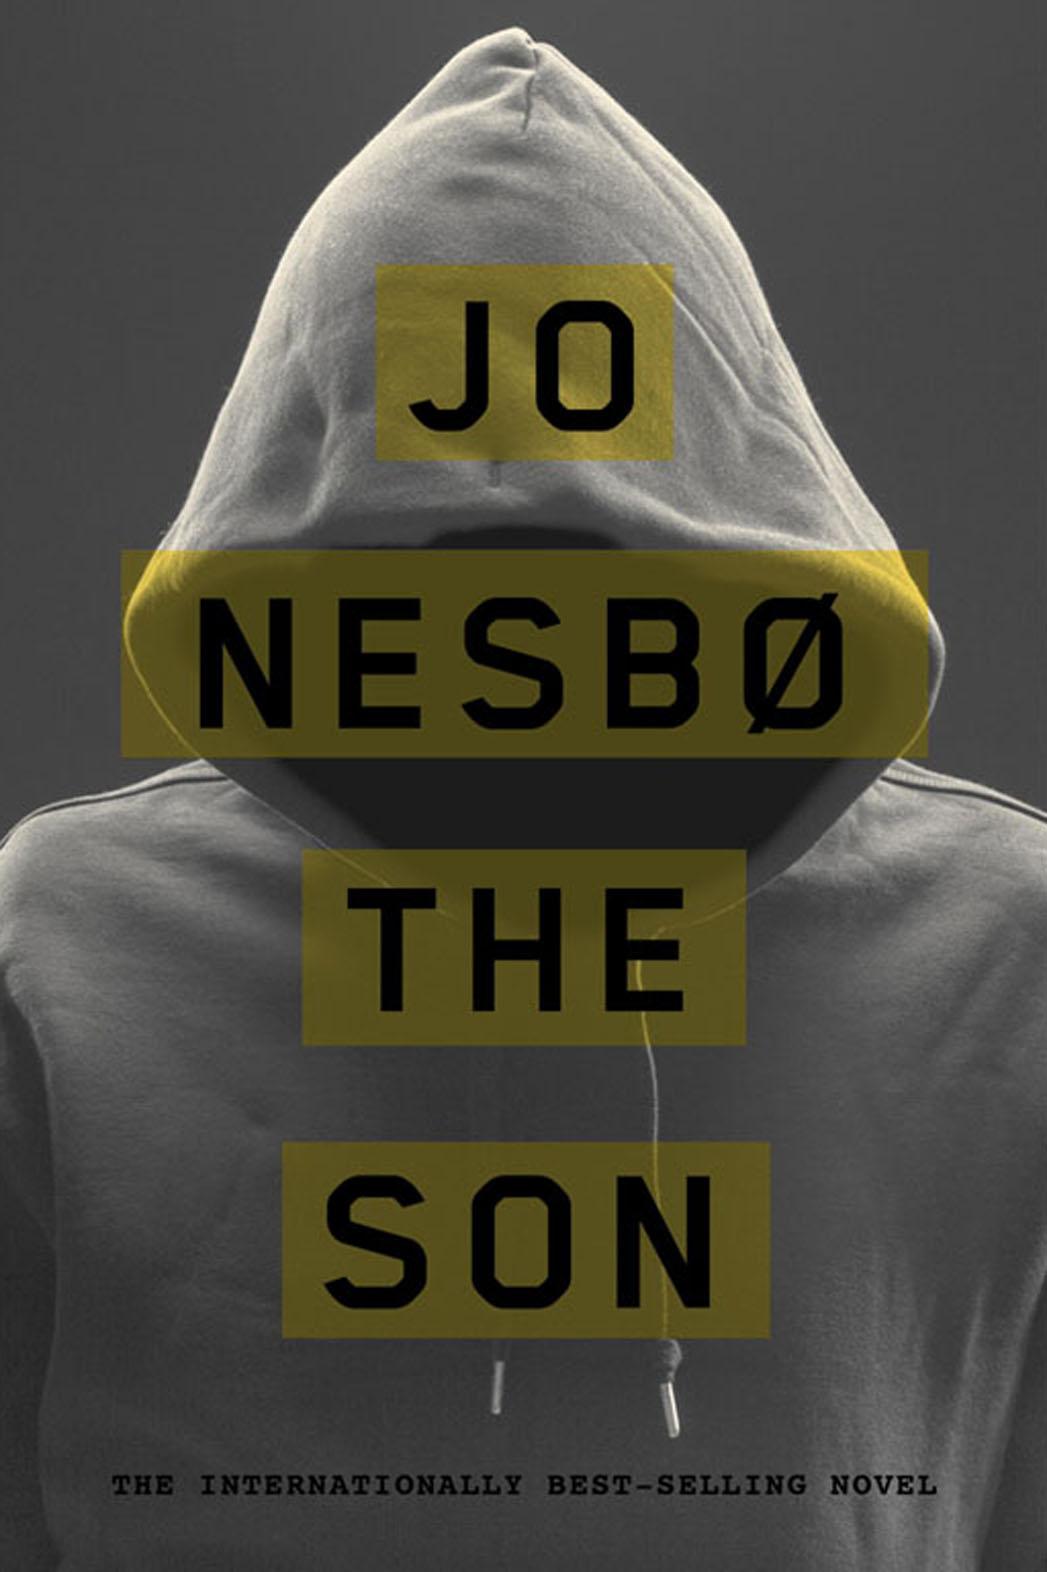 Jo Nesbo Interview on Writing - YouTube